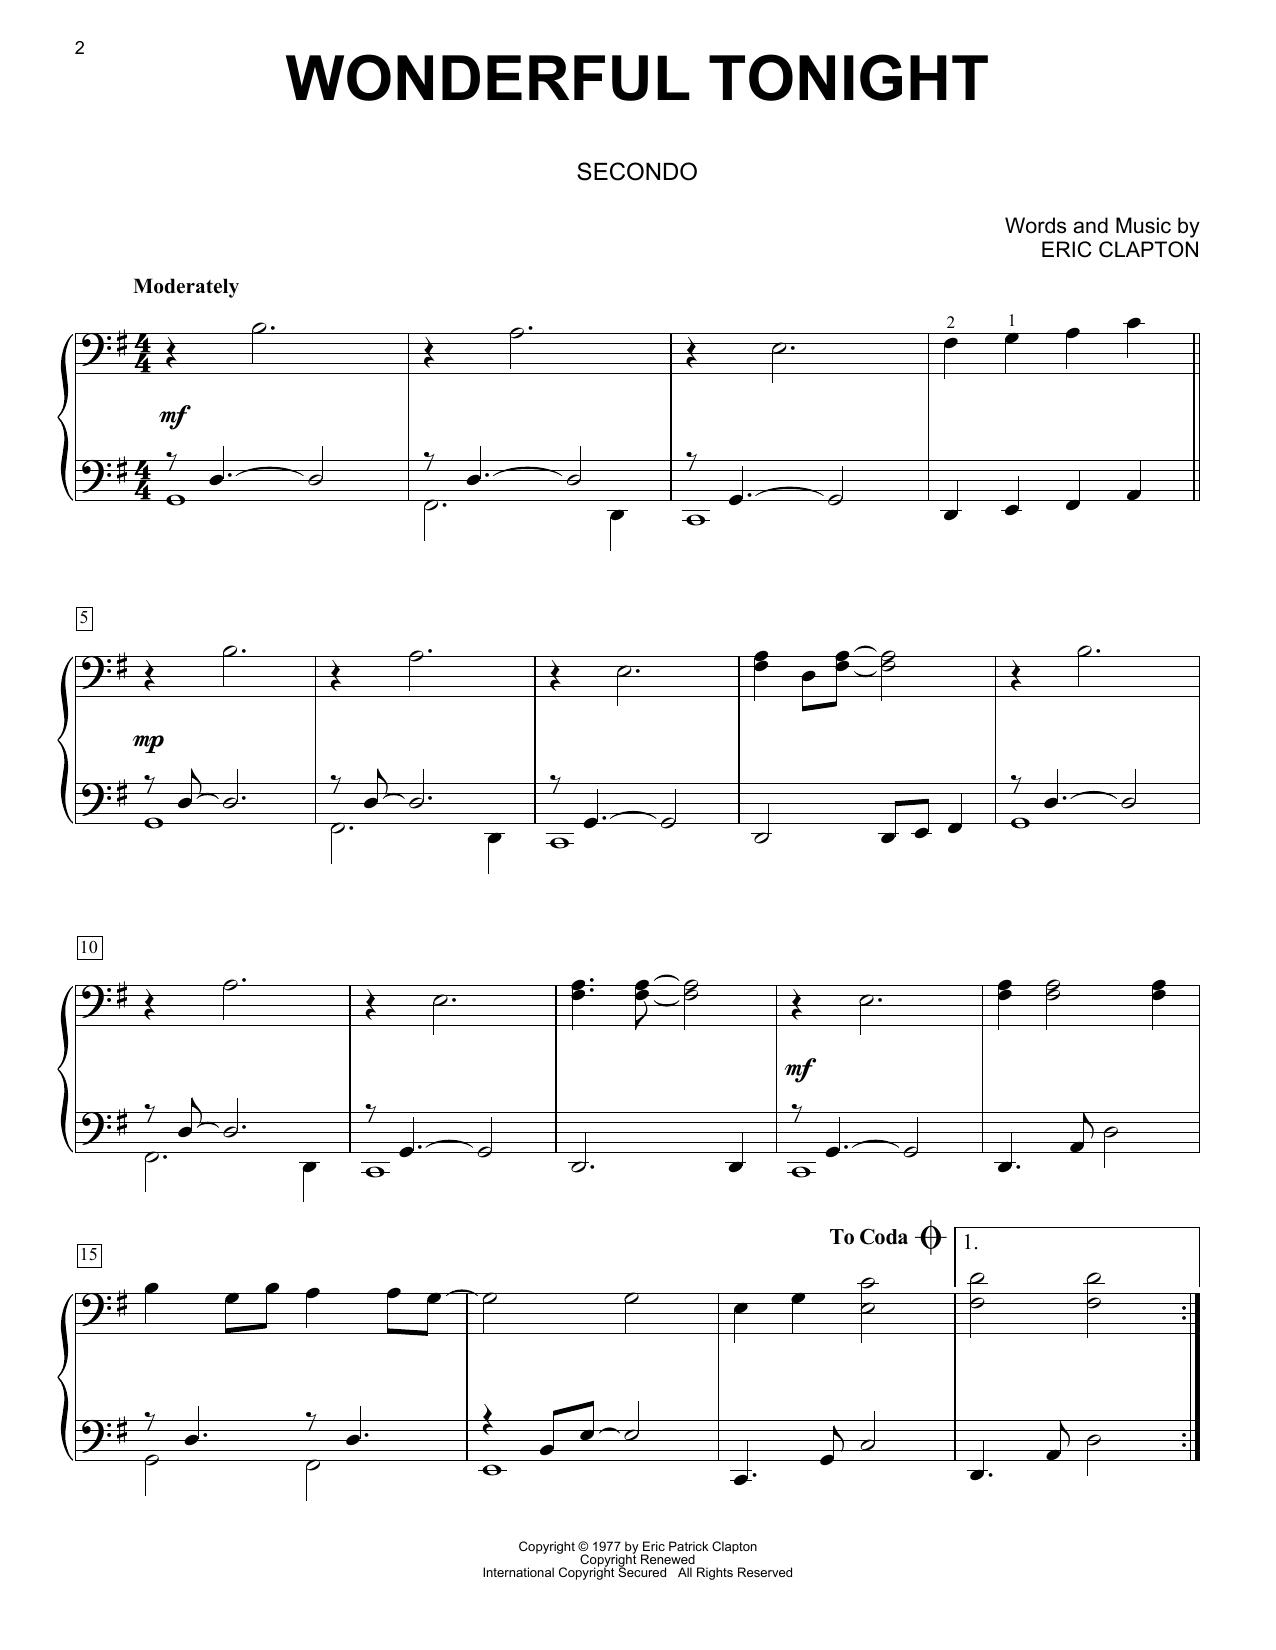 Wonderful Tonight (Piano Duet)